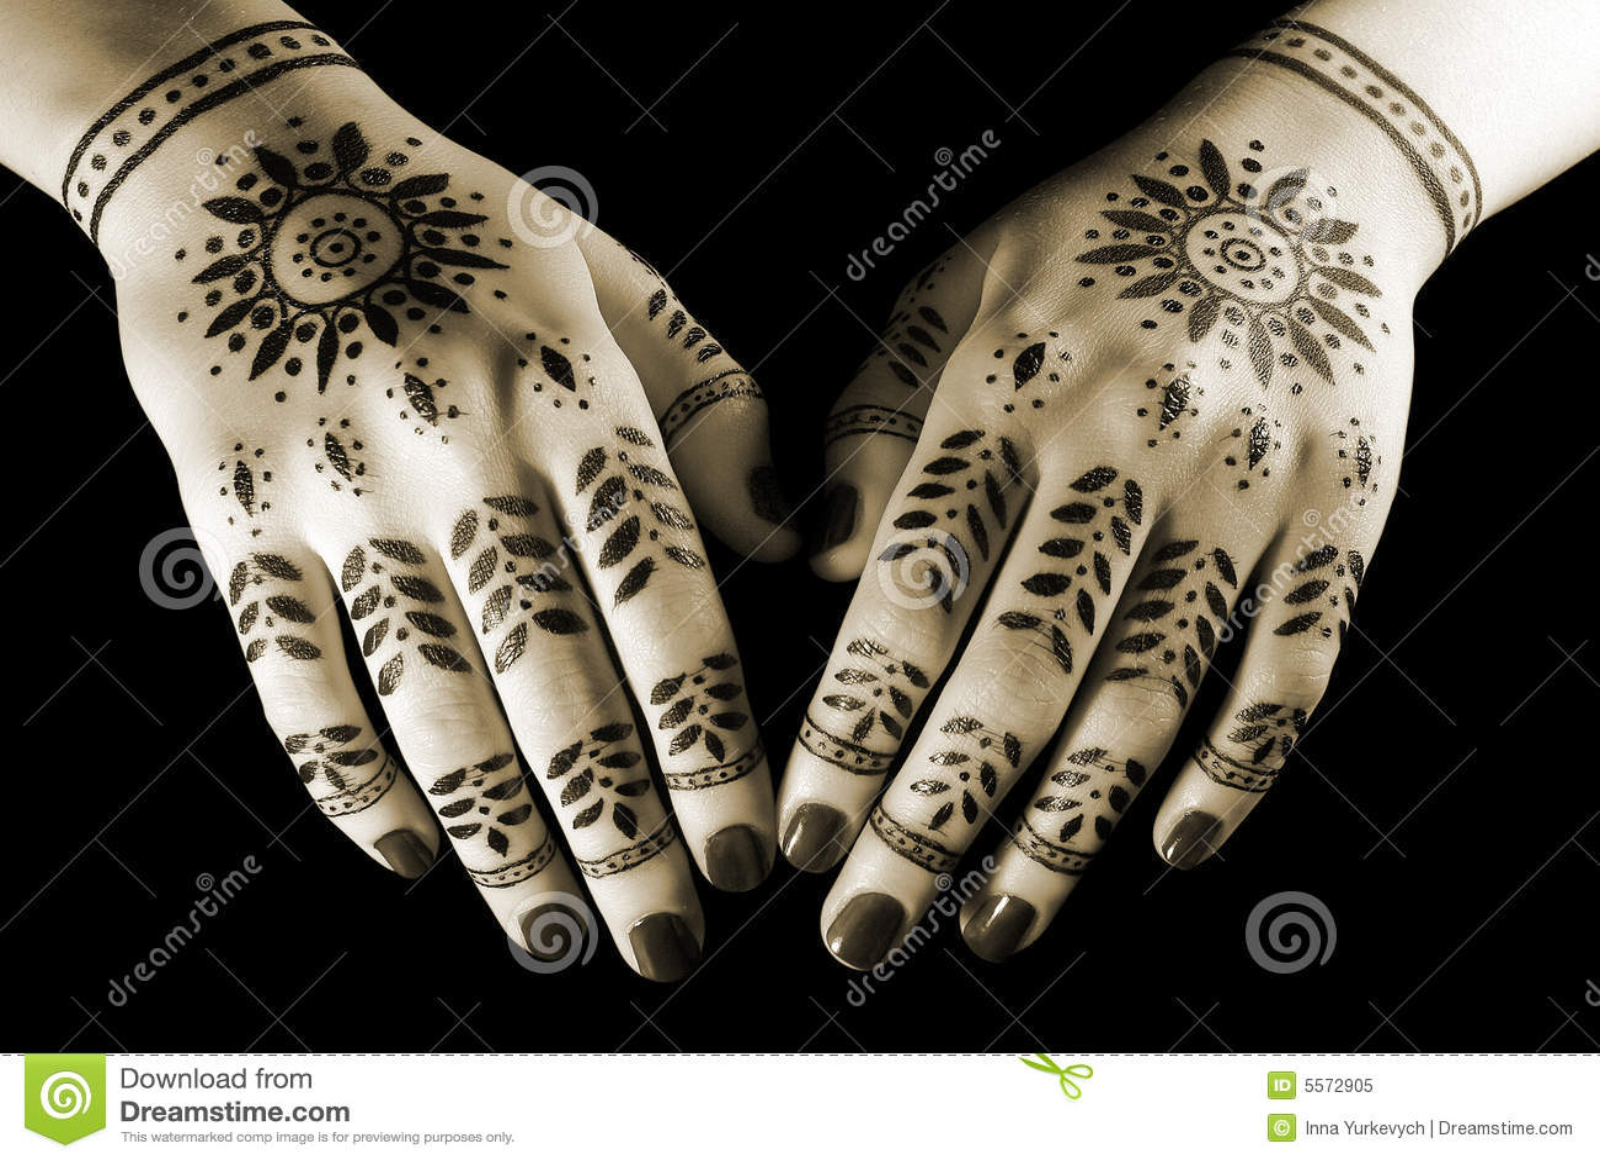 mains avec le tatouage oriental image stock image 5572905. Black Bedroom Furniture Sets. Home Design Ideas